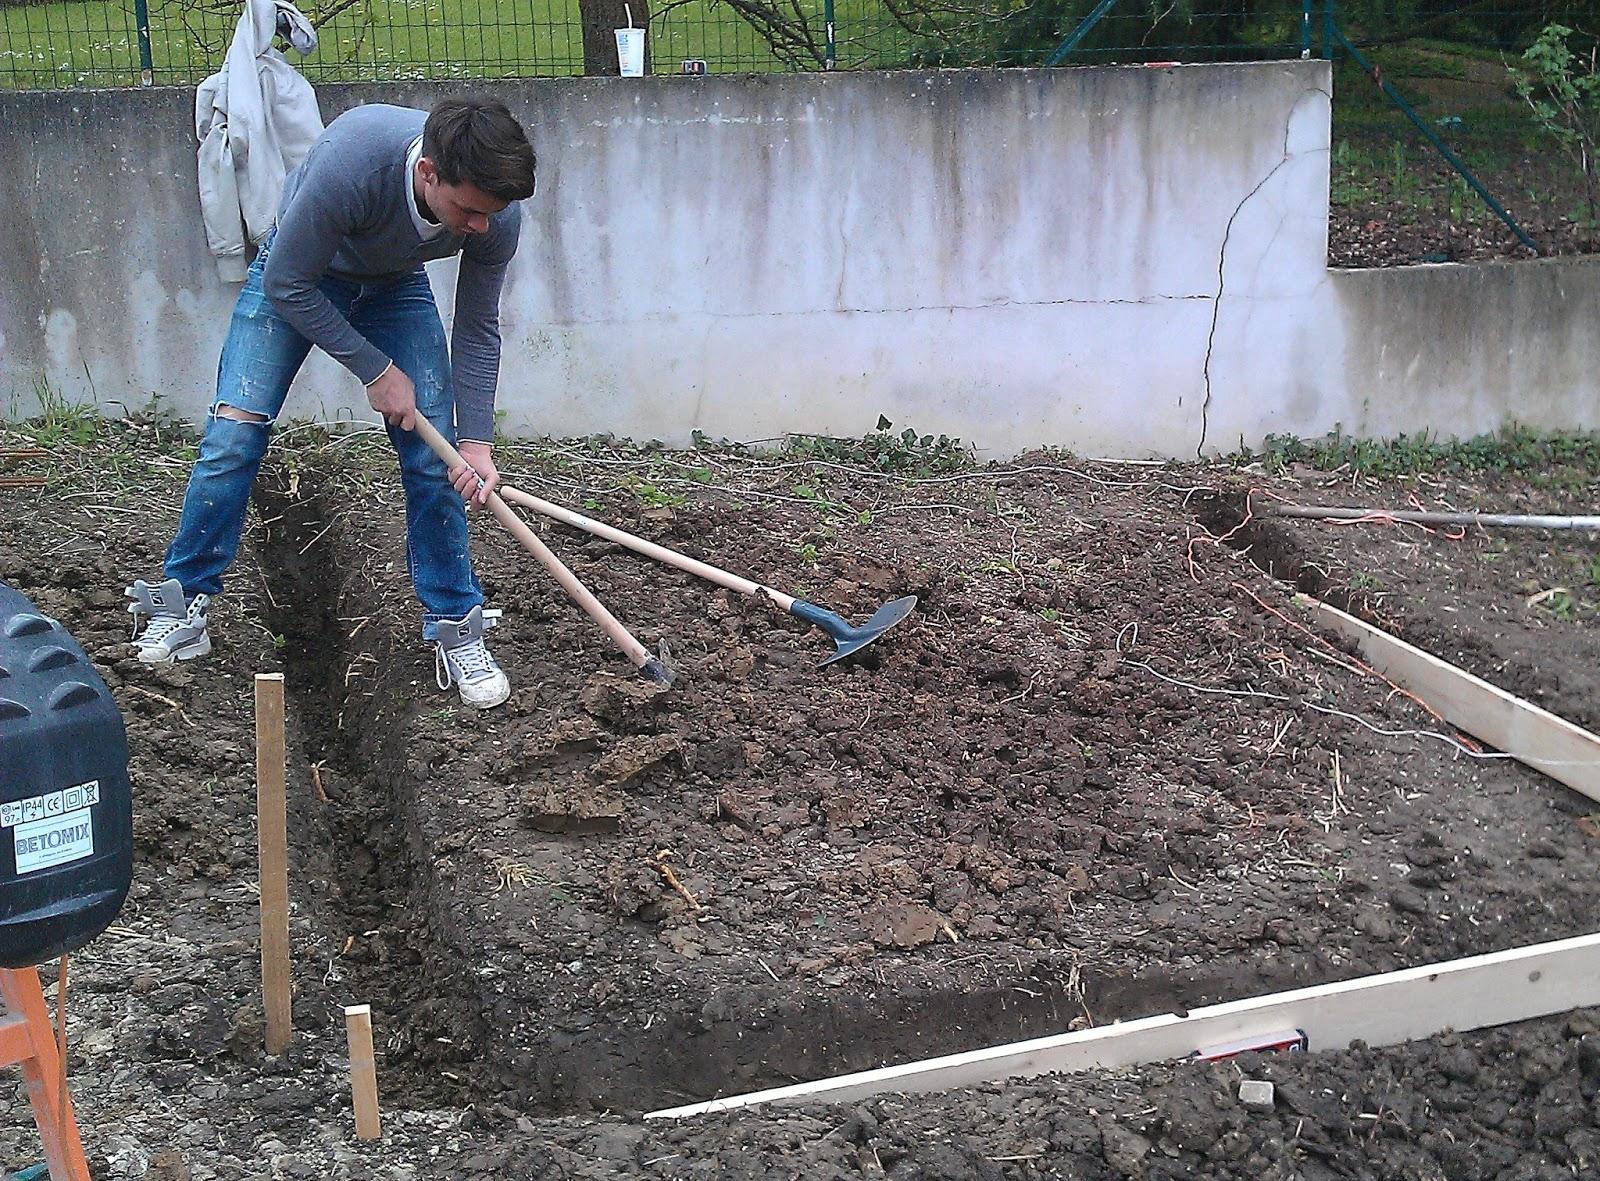 Abri De Jardin Sur Terrain En Pente Angers Maison Design Trivid Us # Abris De Jardin Amberieu